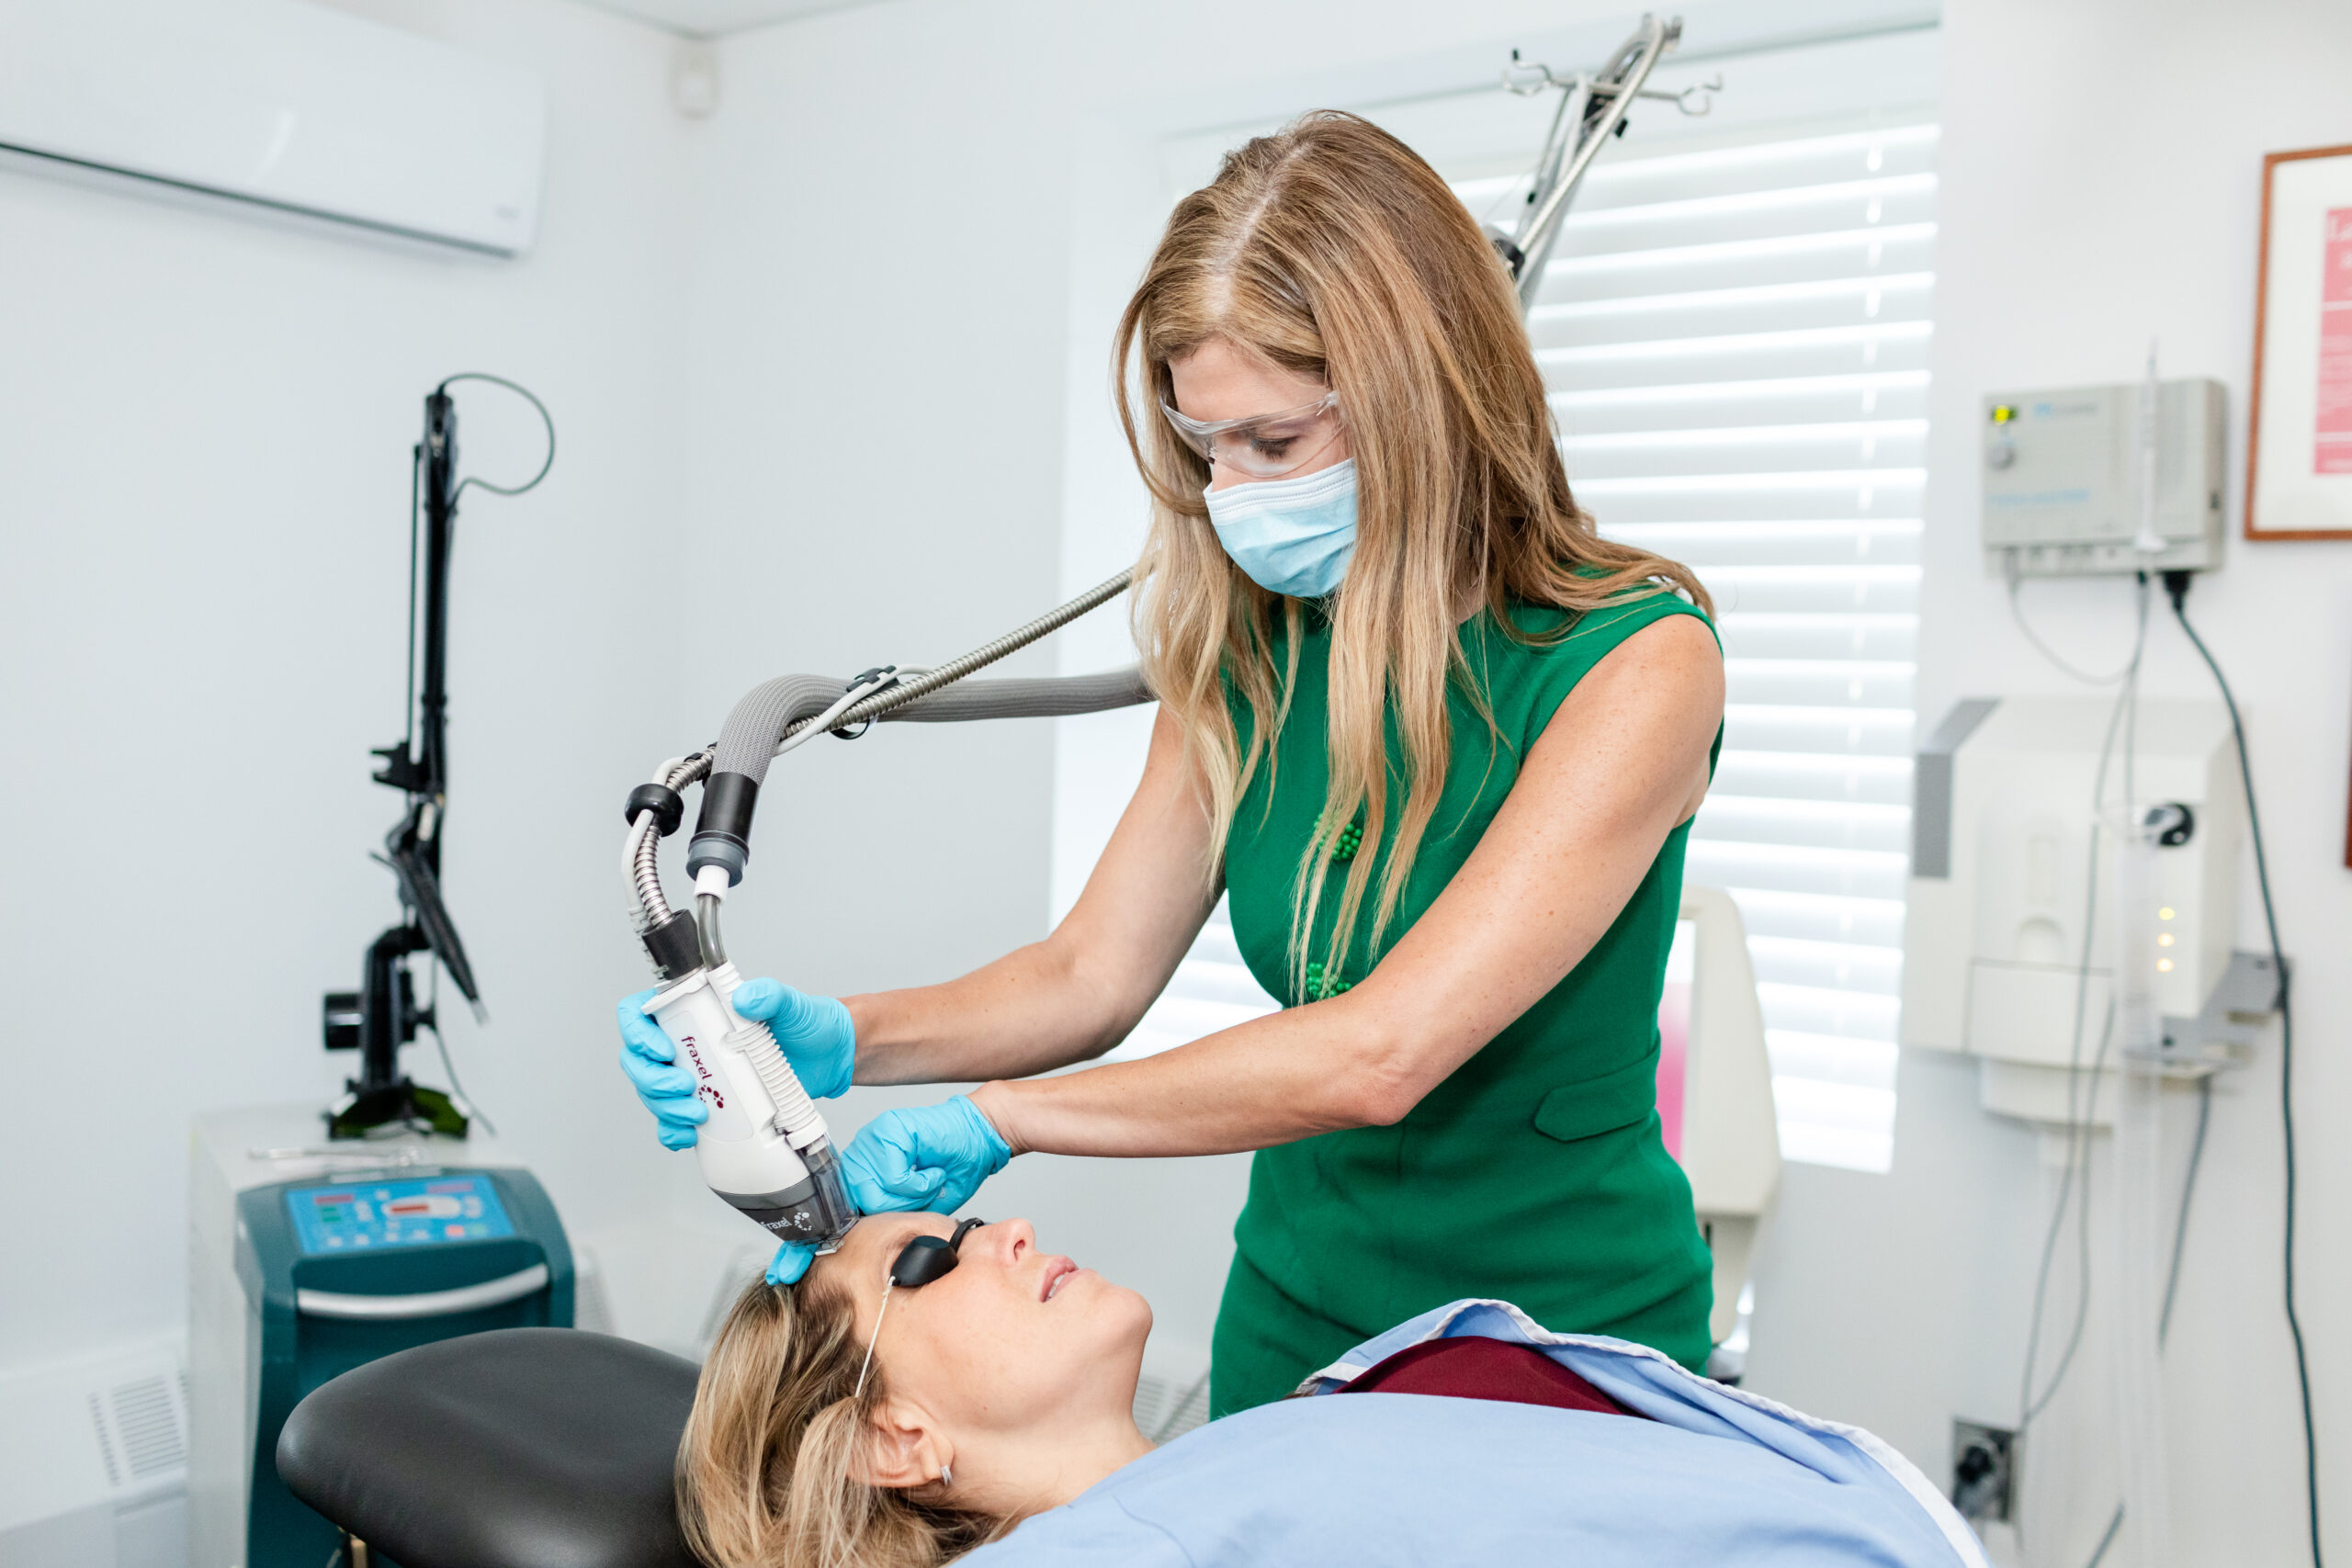 Dr_Stern_treating_patient_laser_Laser_Skin_Surgery_Center_Plastic_New_York